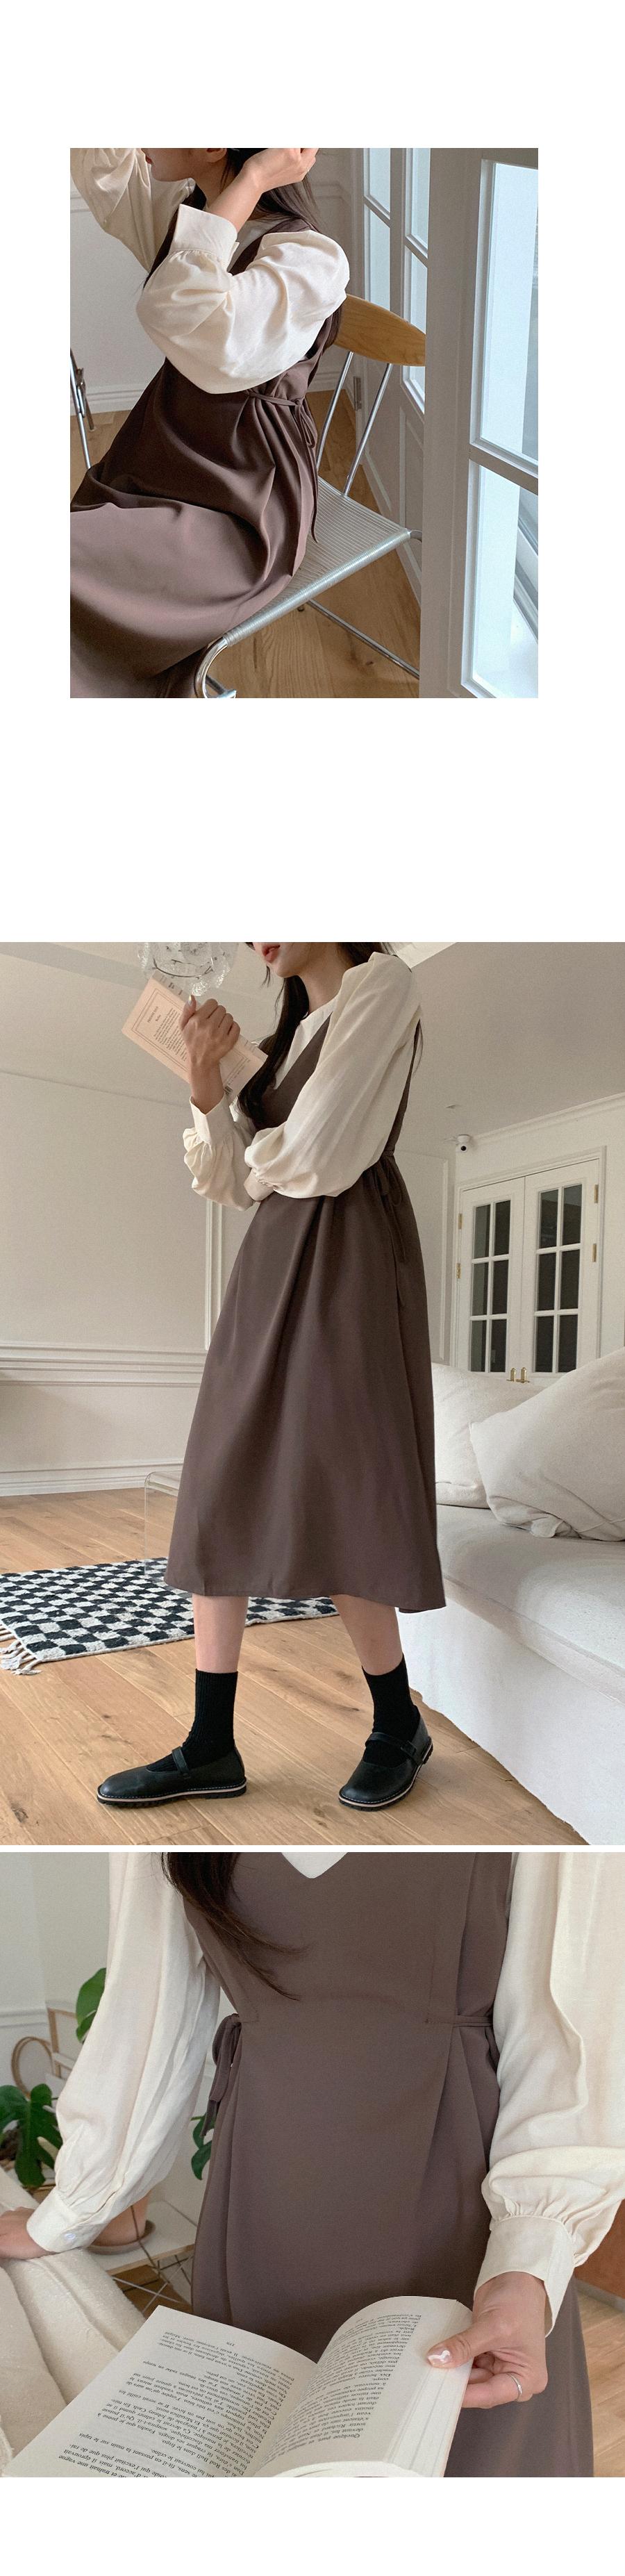 Girly You Blouse + Dress Set